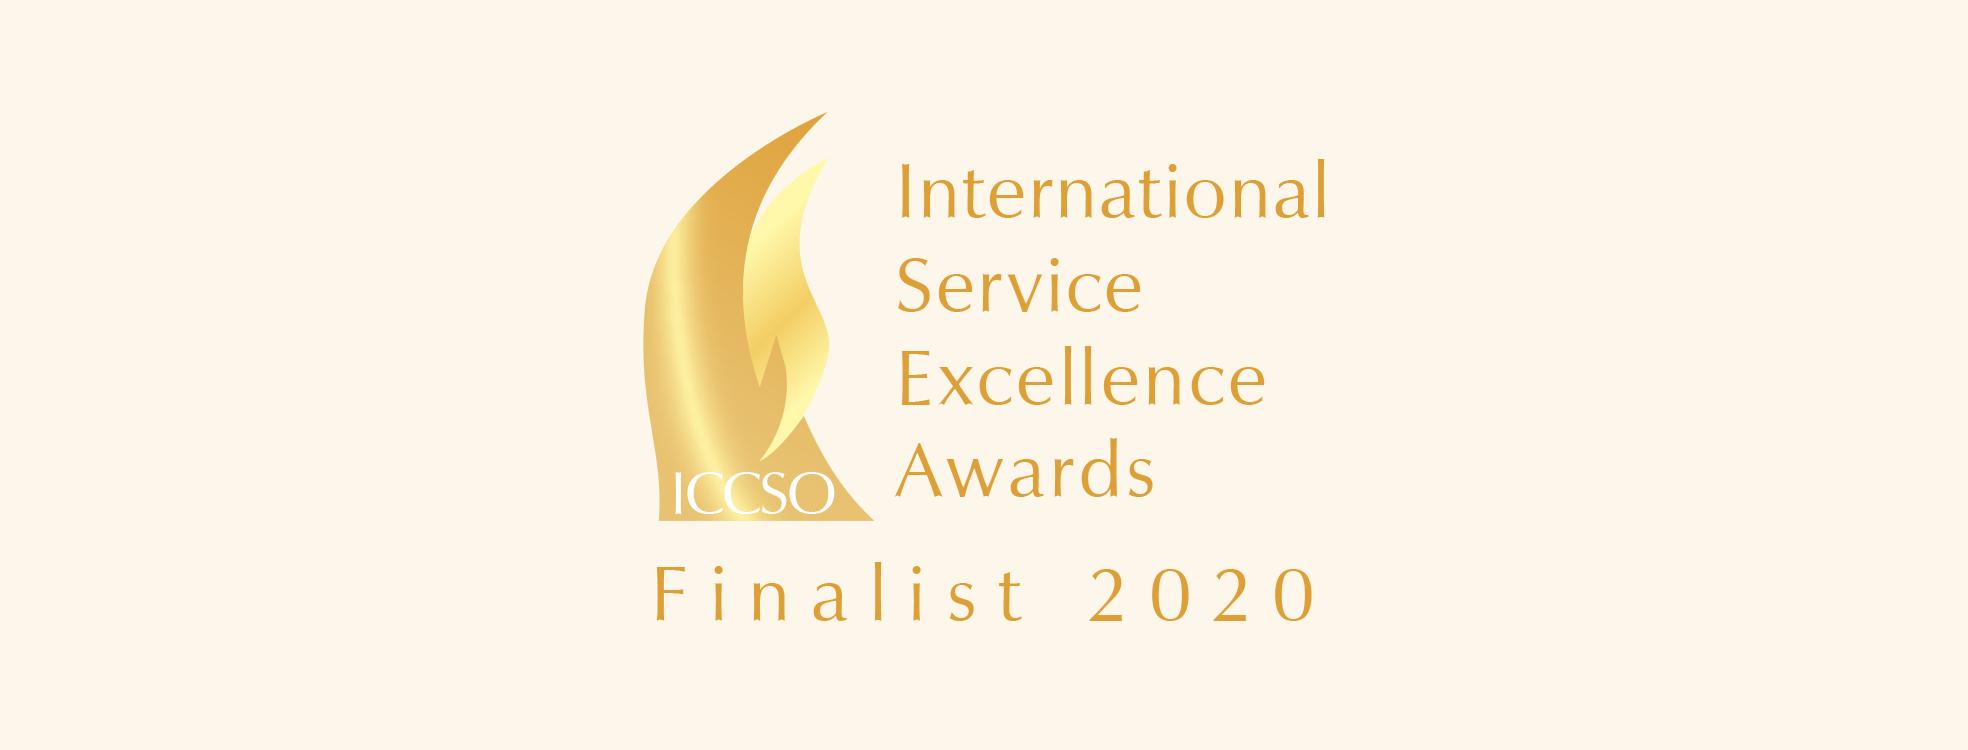 International Service Excellence Awards Finalist 2020